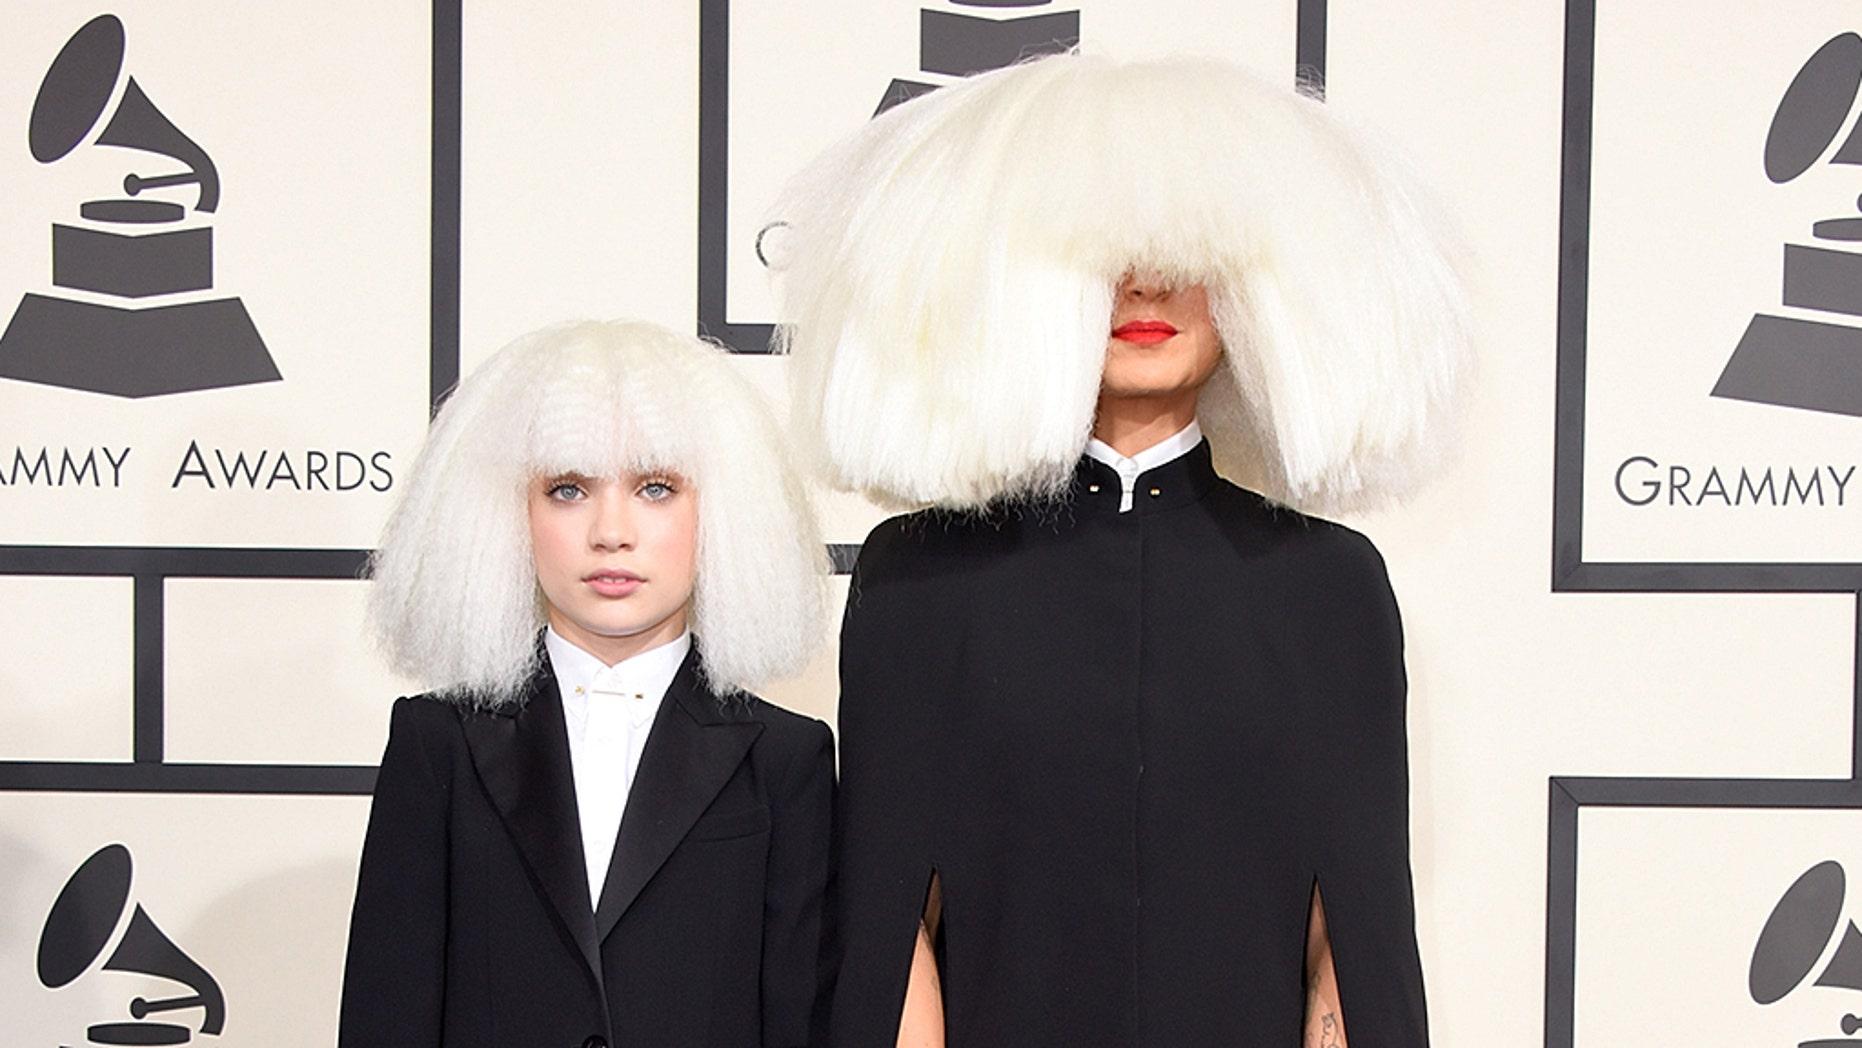 Pop star Sia (right) gave dancer Maddie Ziegler (left) an Audi for her birthday.